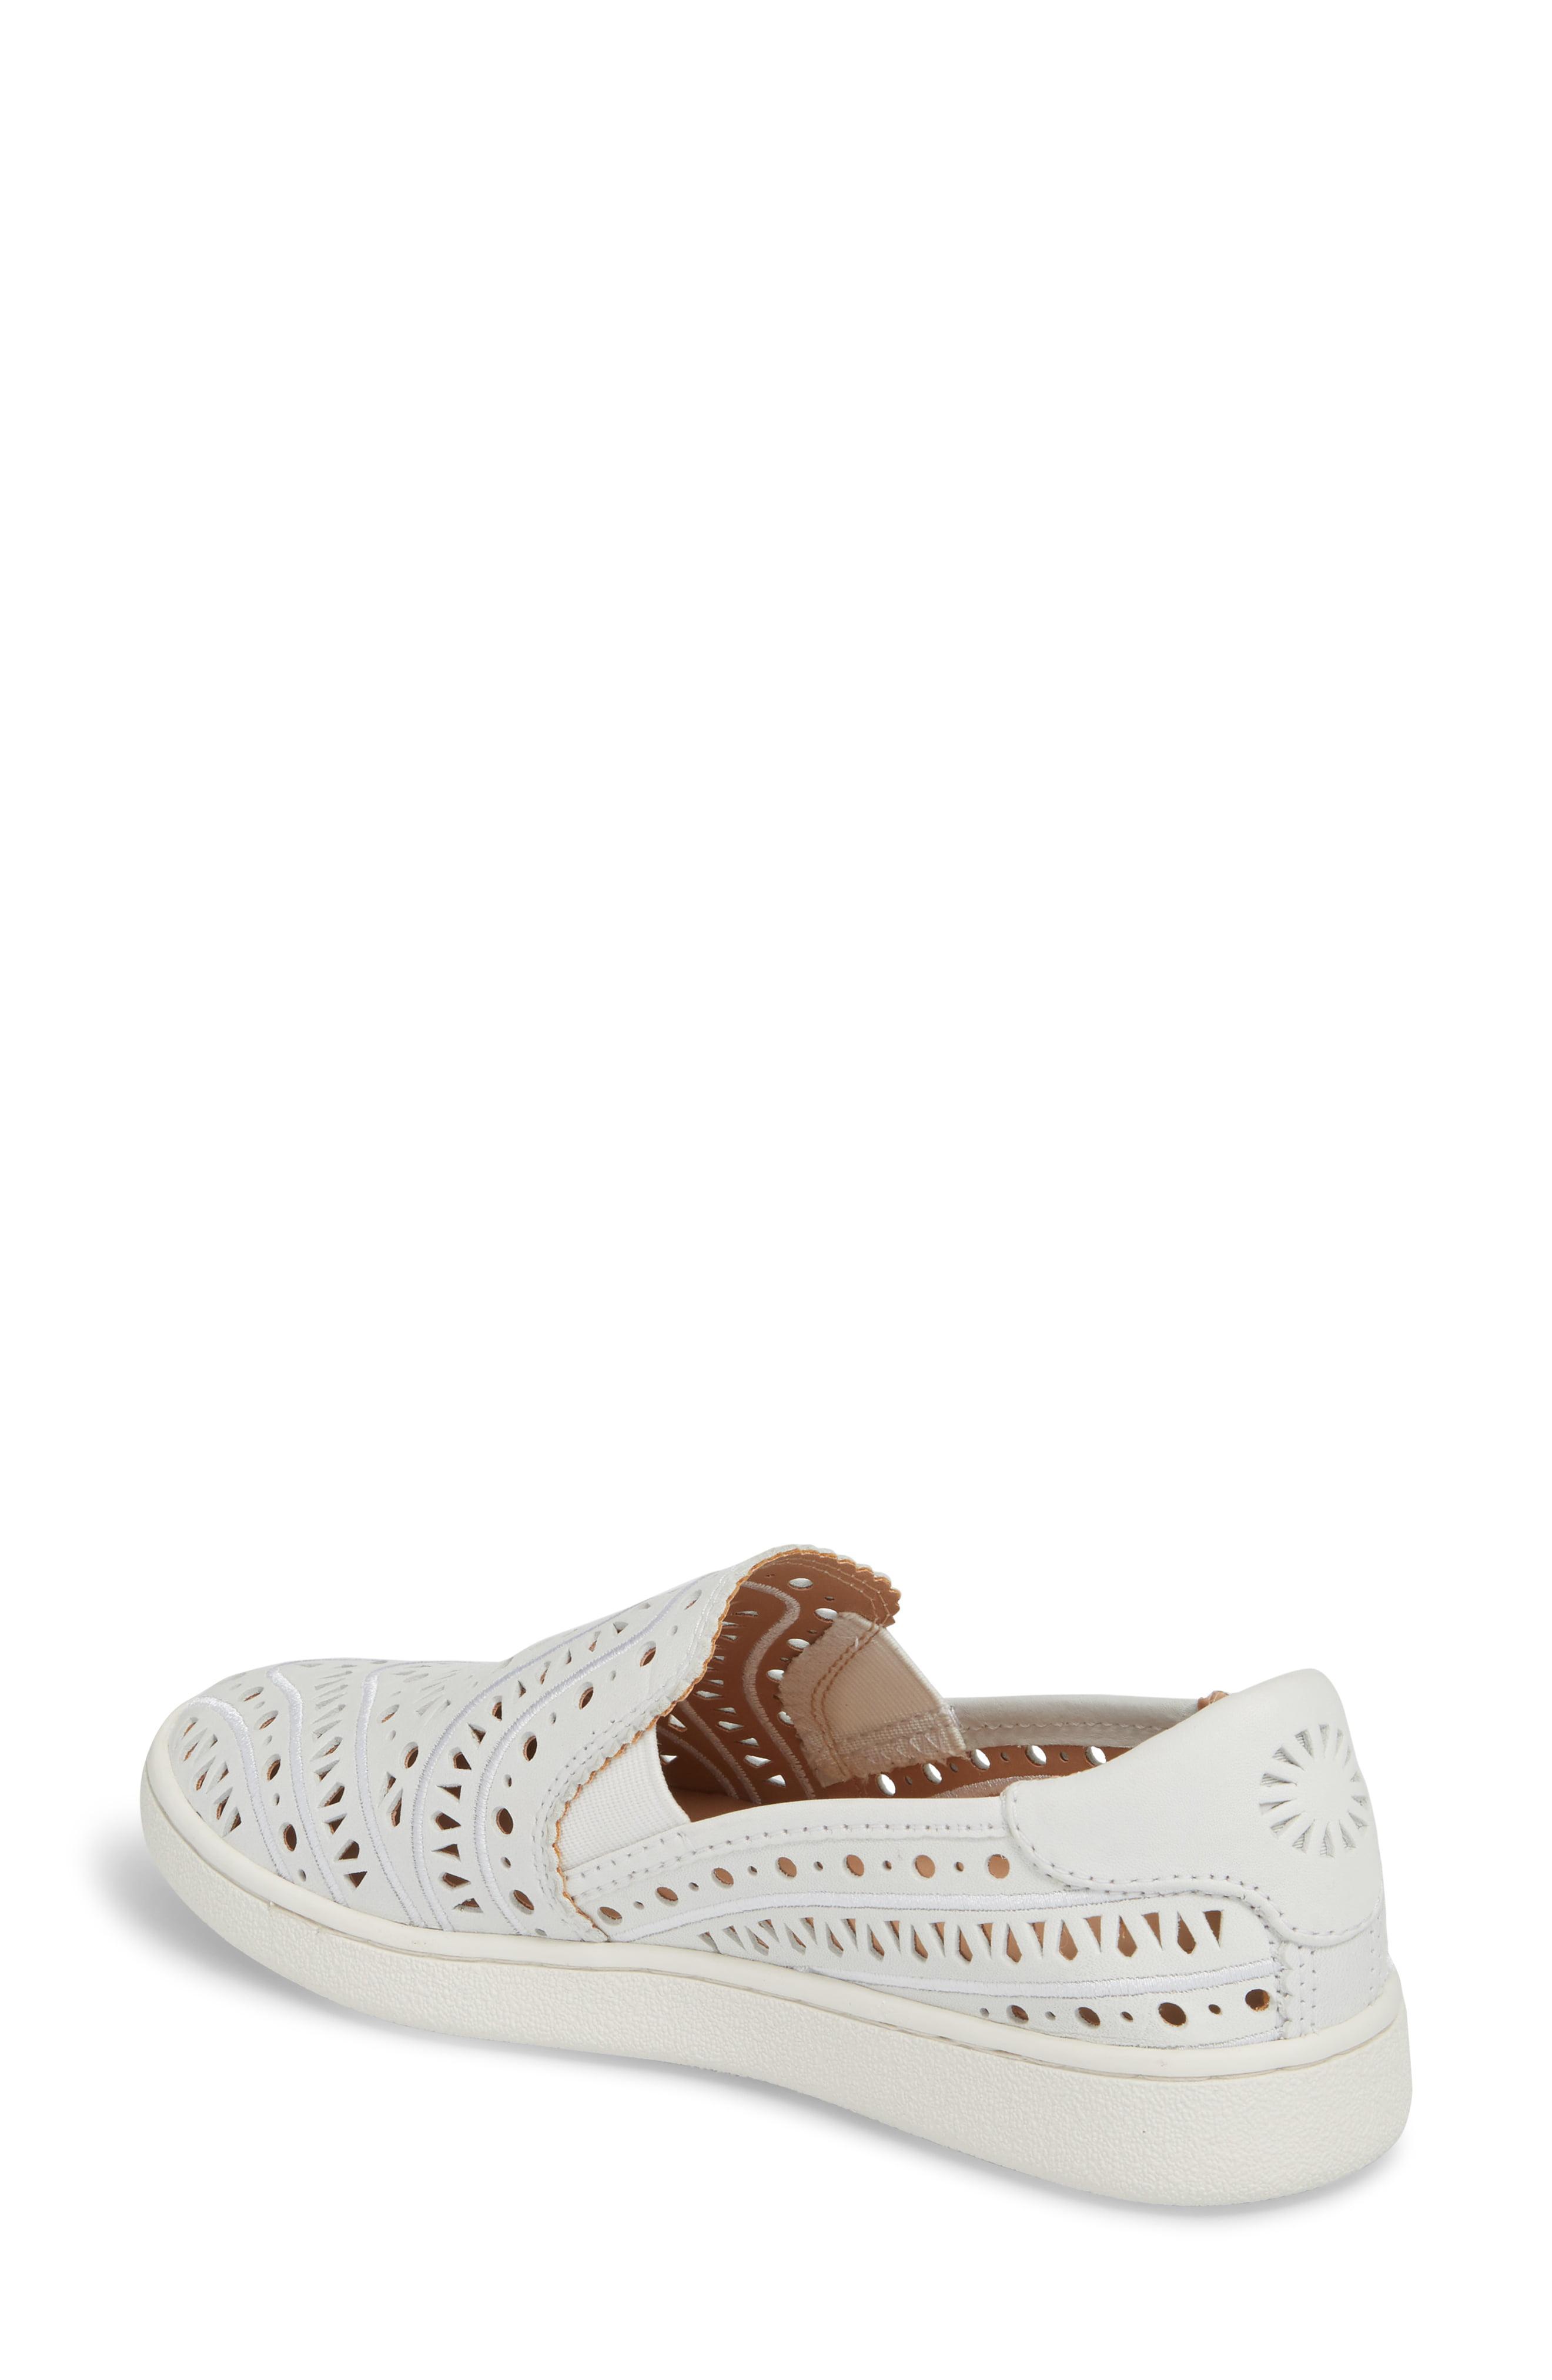 7bc883e93c4 Women's White Ugg Cas Perforated Slip-on Sneaker